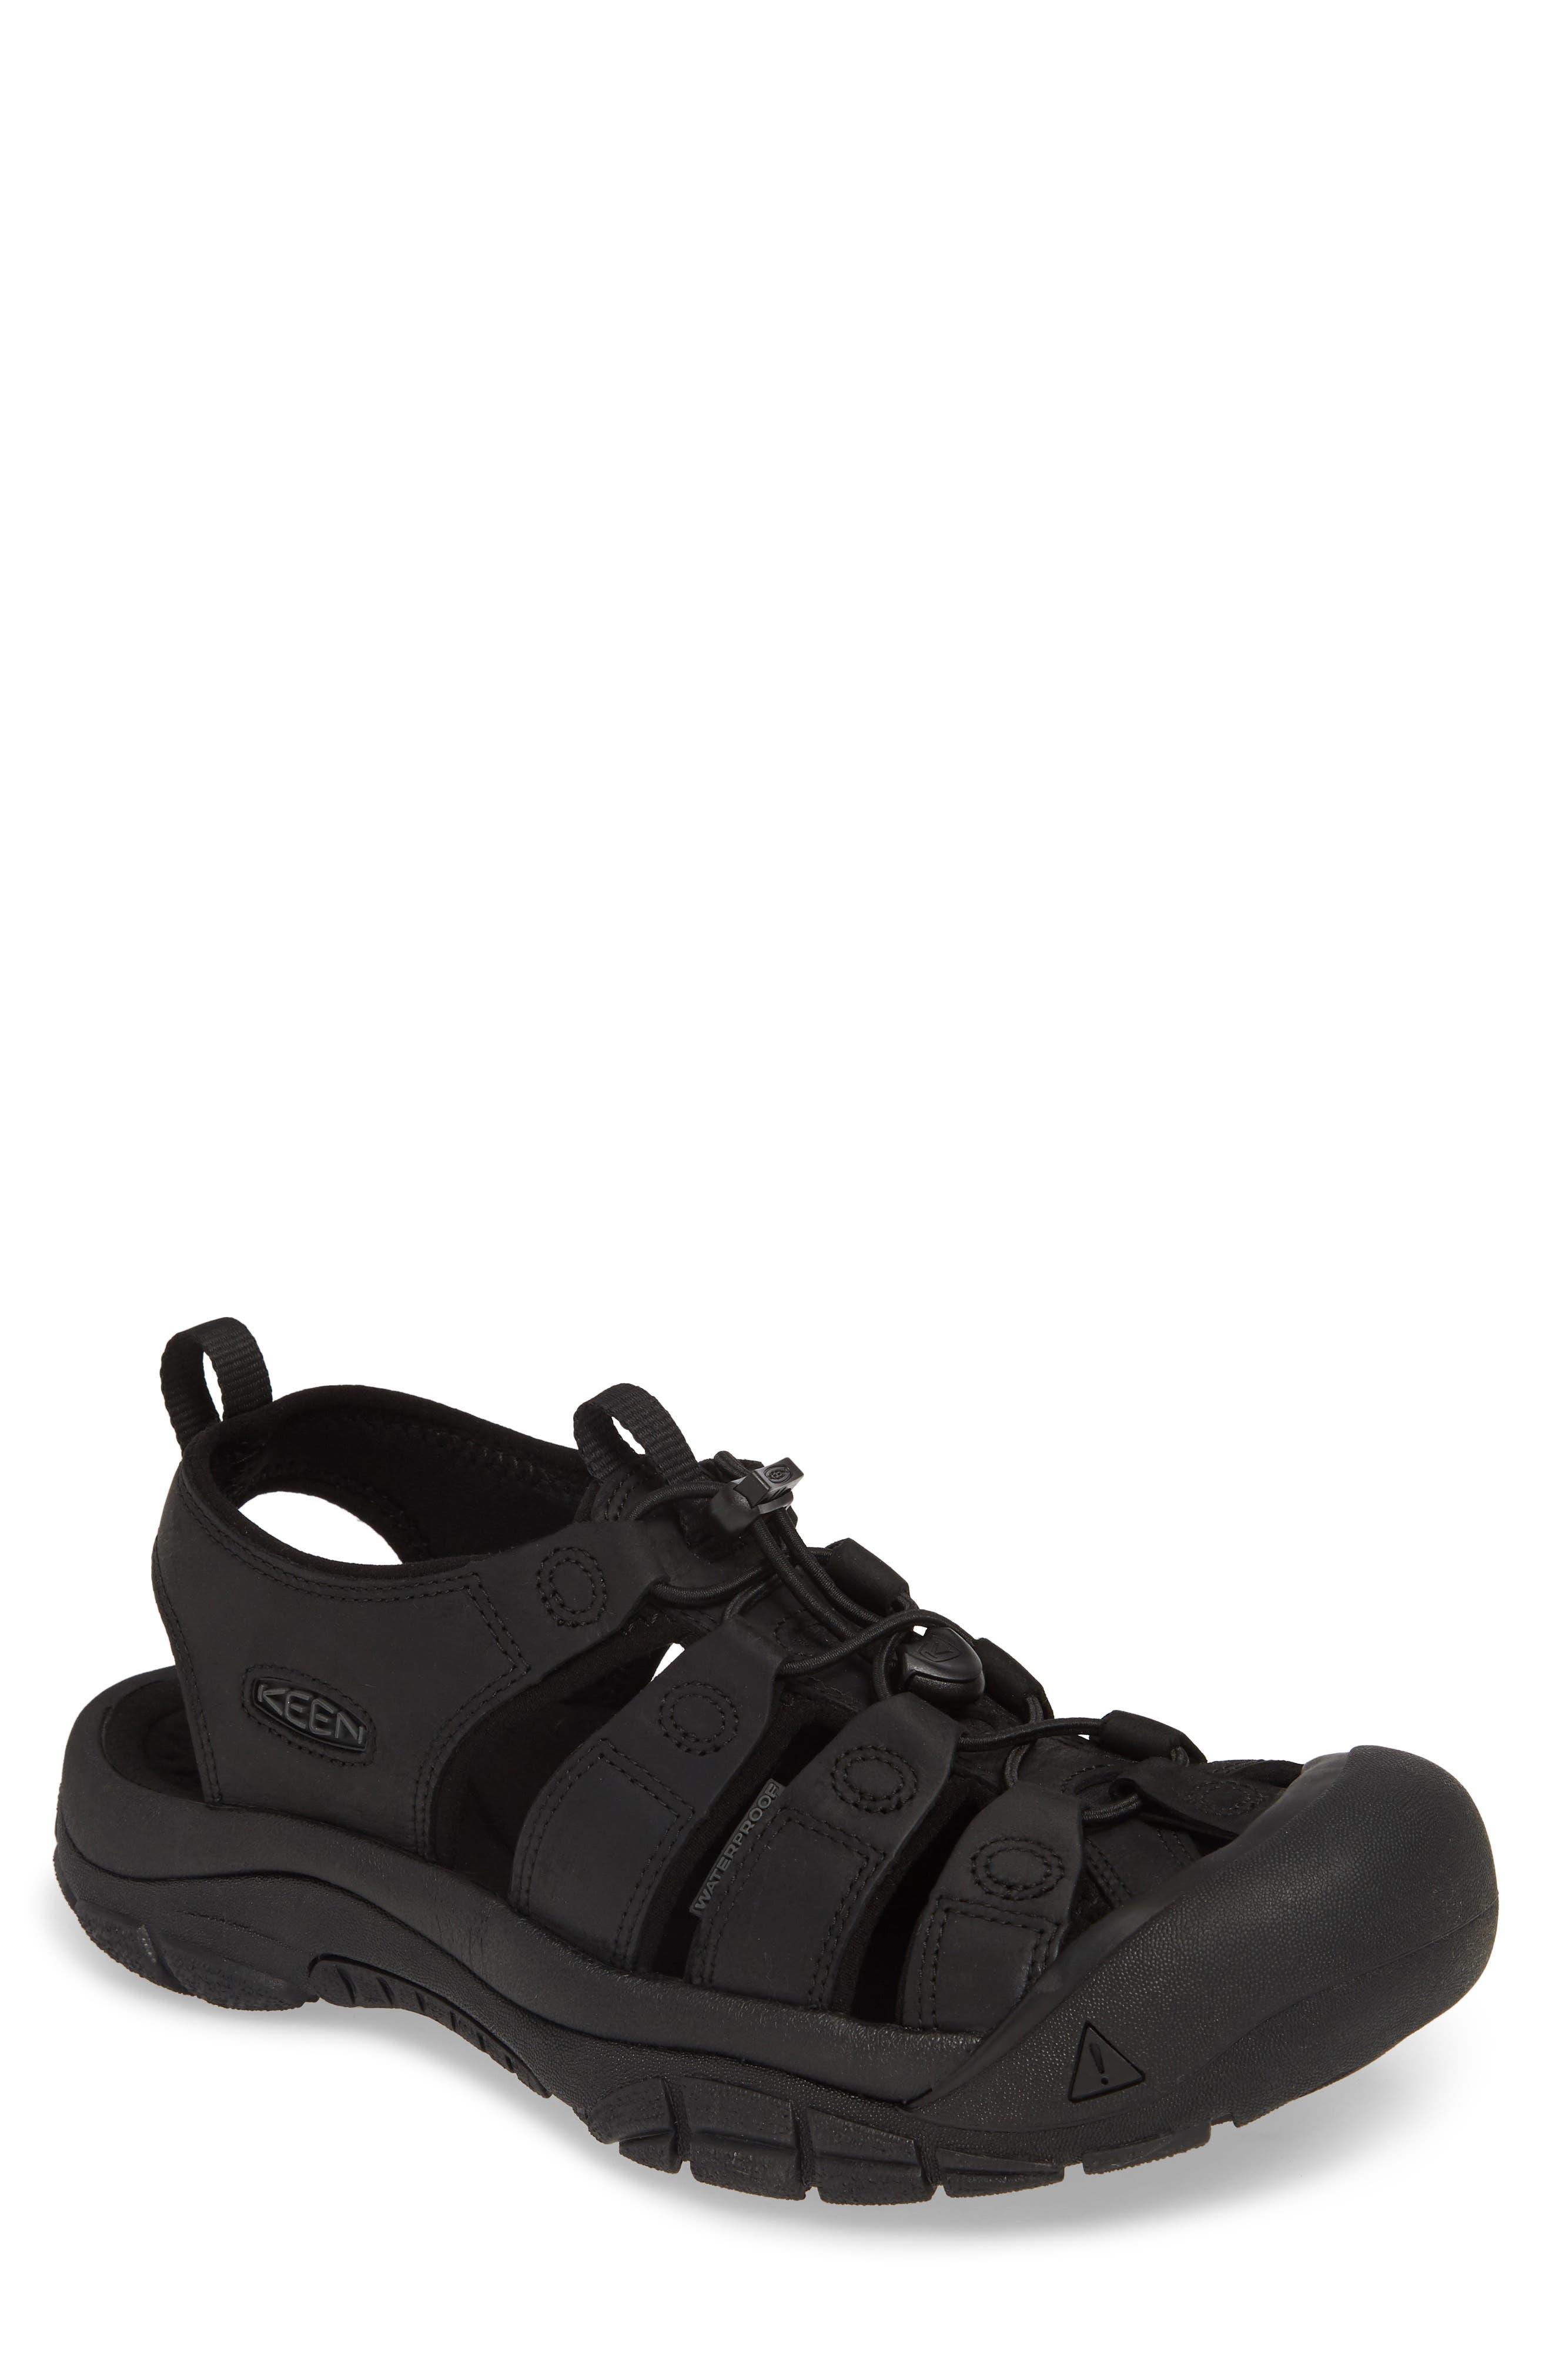 KEEN 'Newport' Sandal, Main, color, BLACK/ BLACK